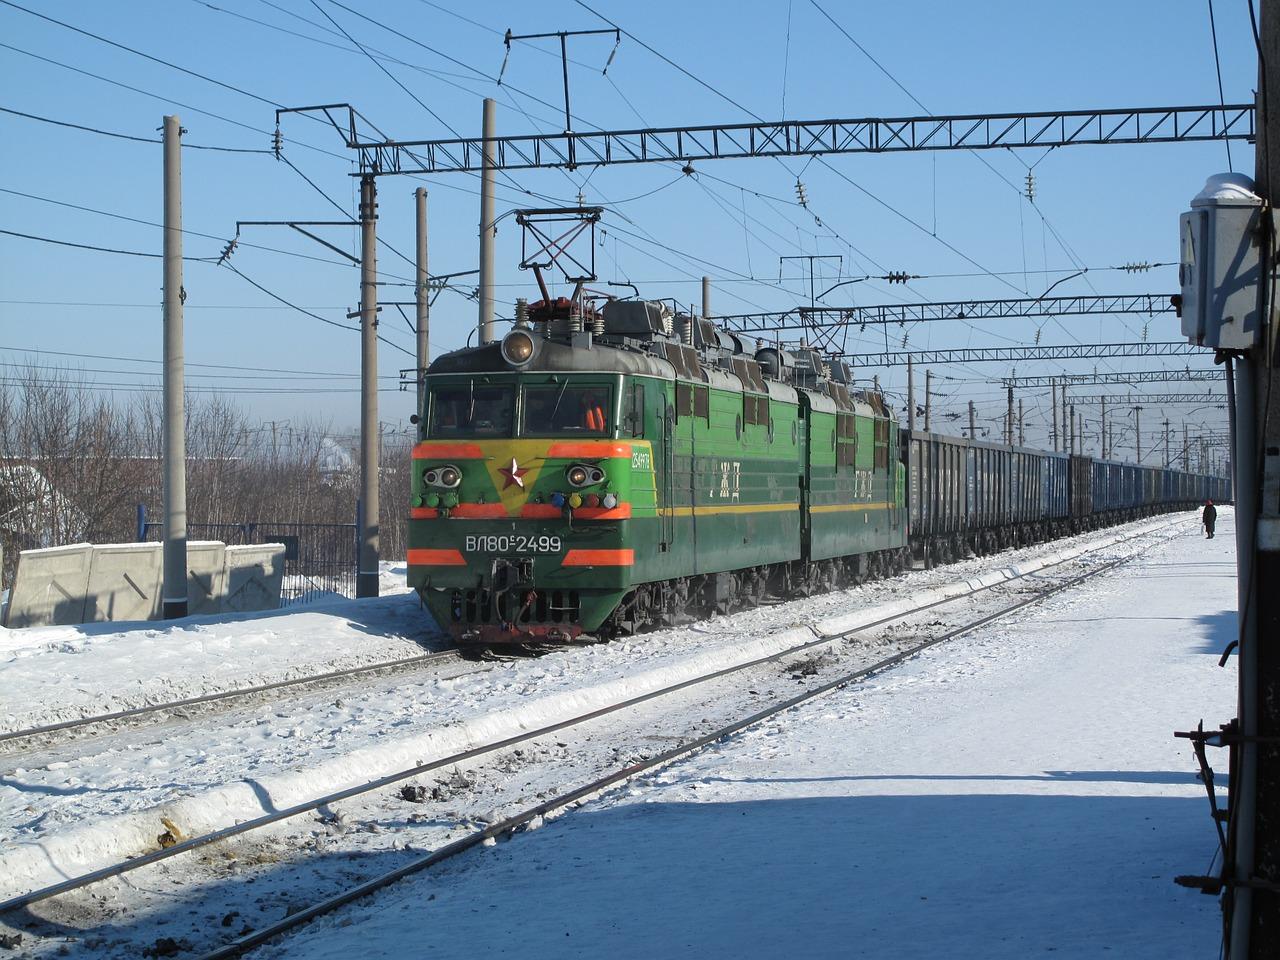 train-647288_1280